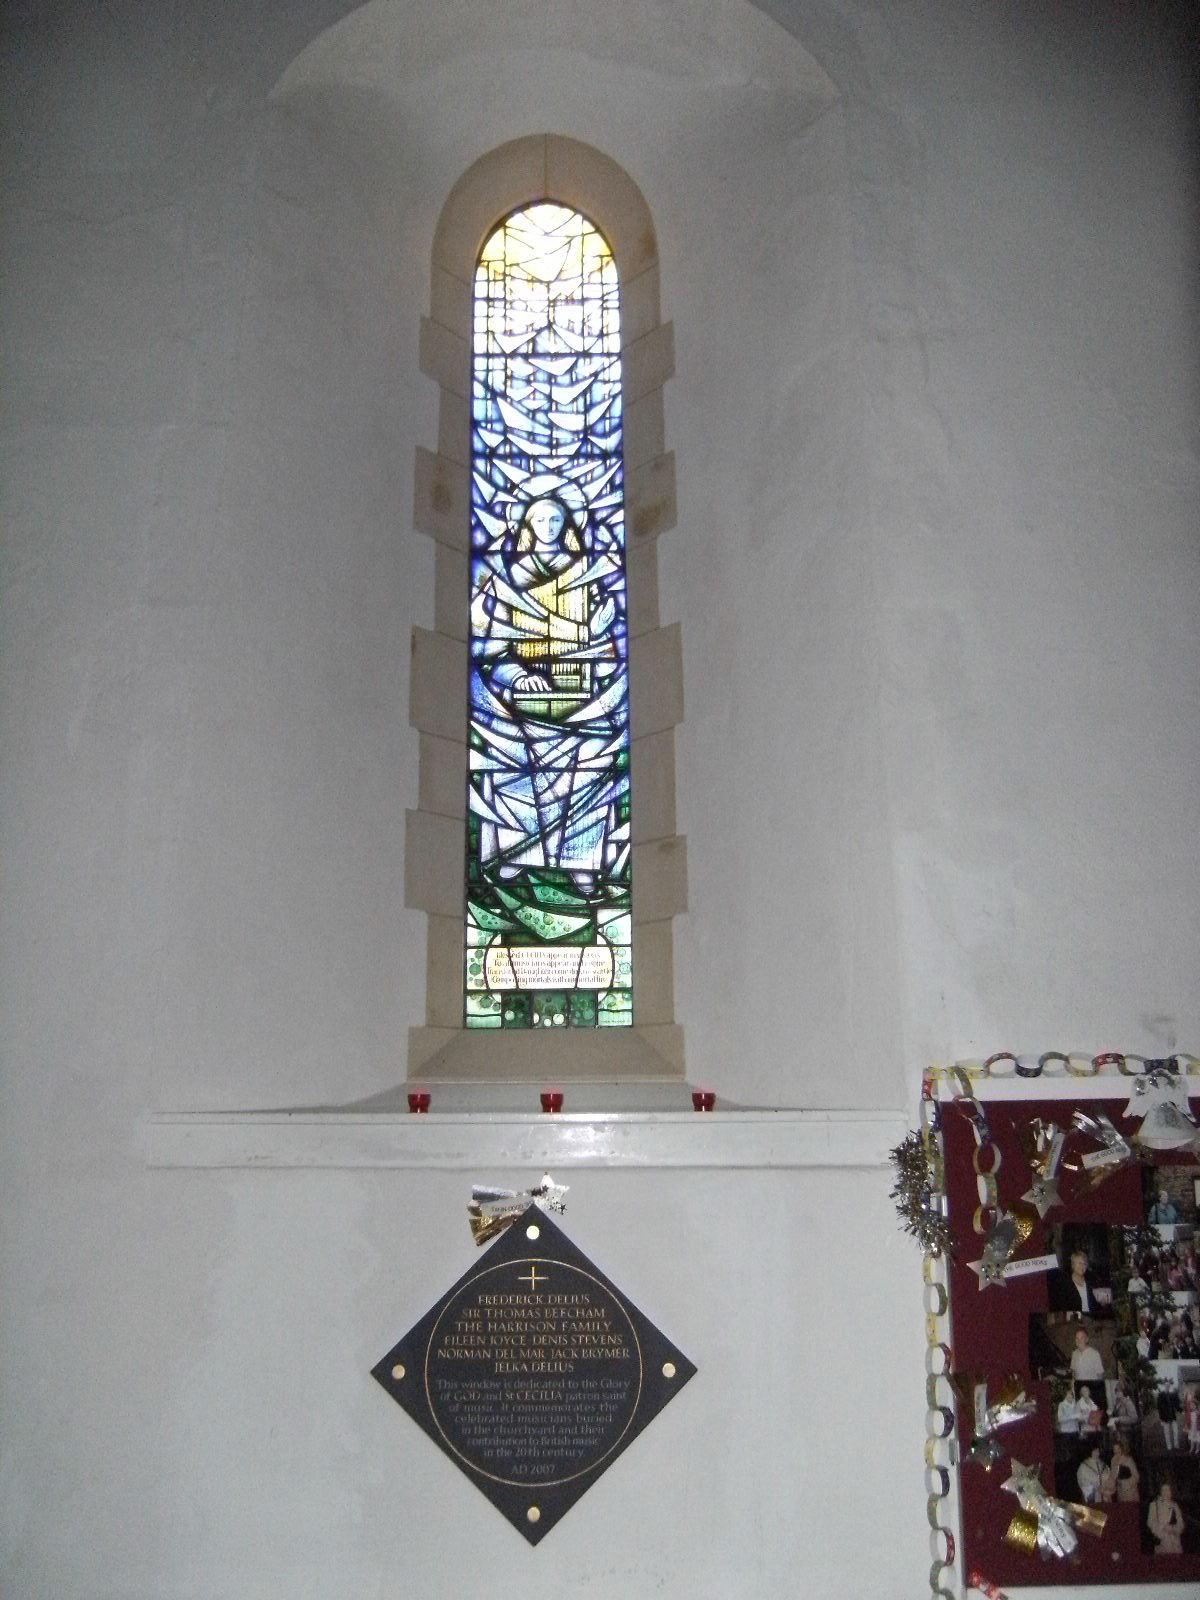 DSCF0021 St Cecilia window, Limpsfield church